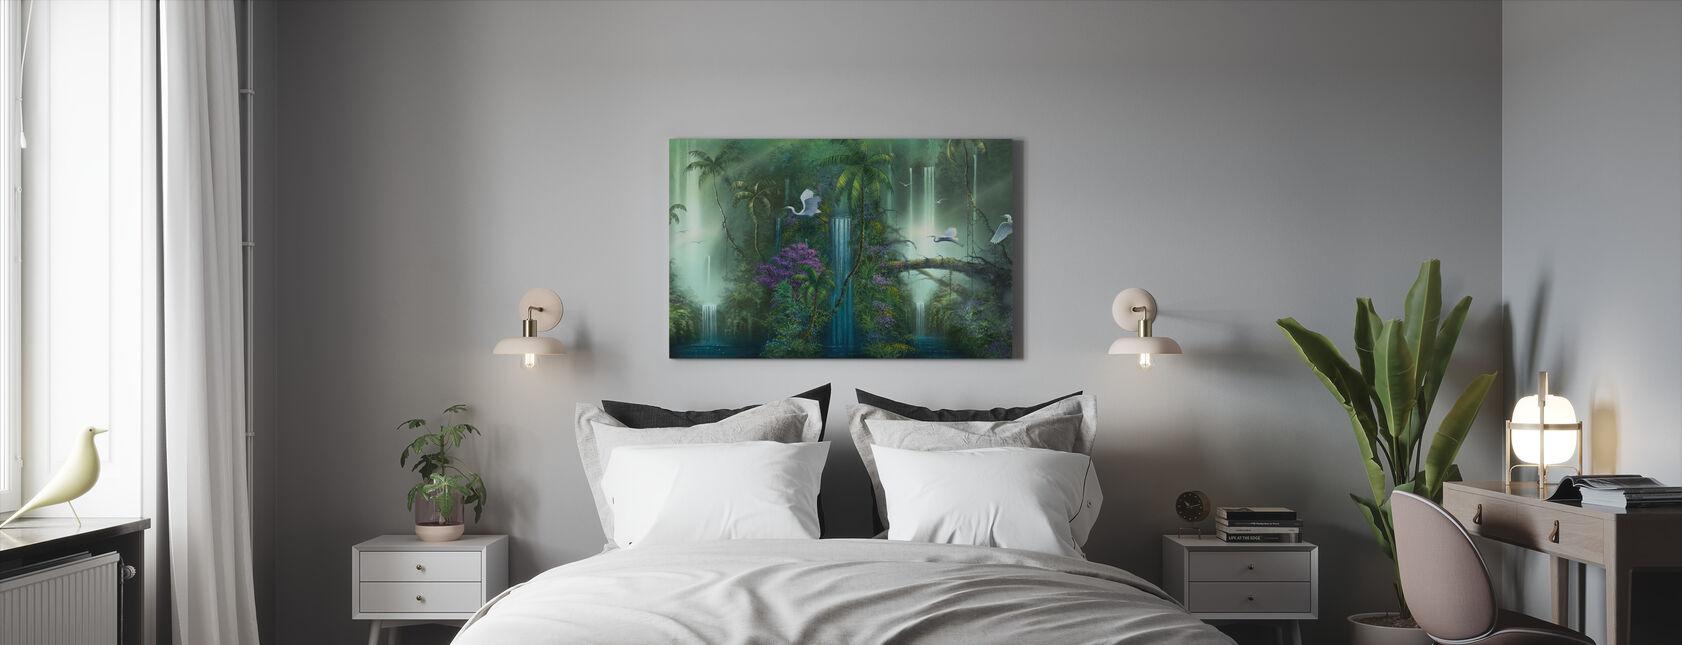 Vesiputous fantasia - Canvastaulu - Makuuhuone